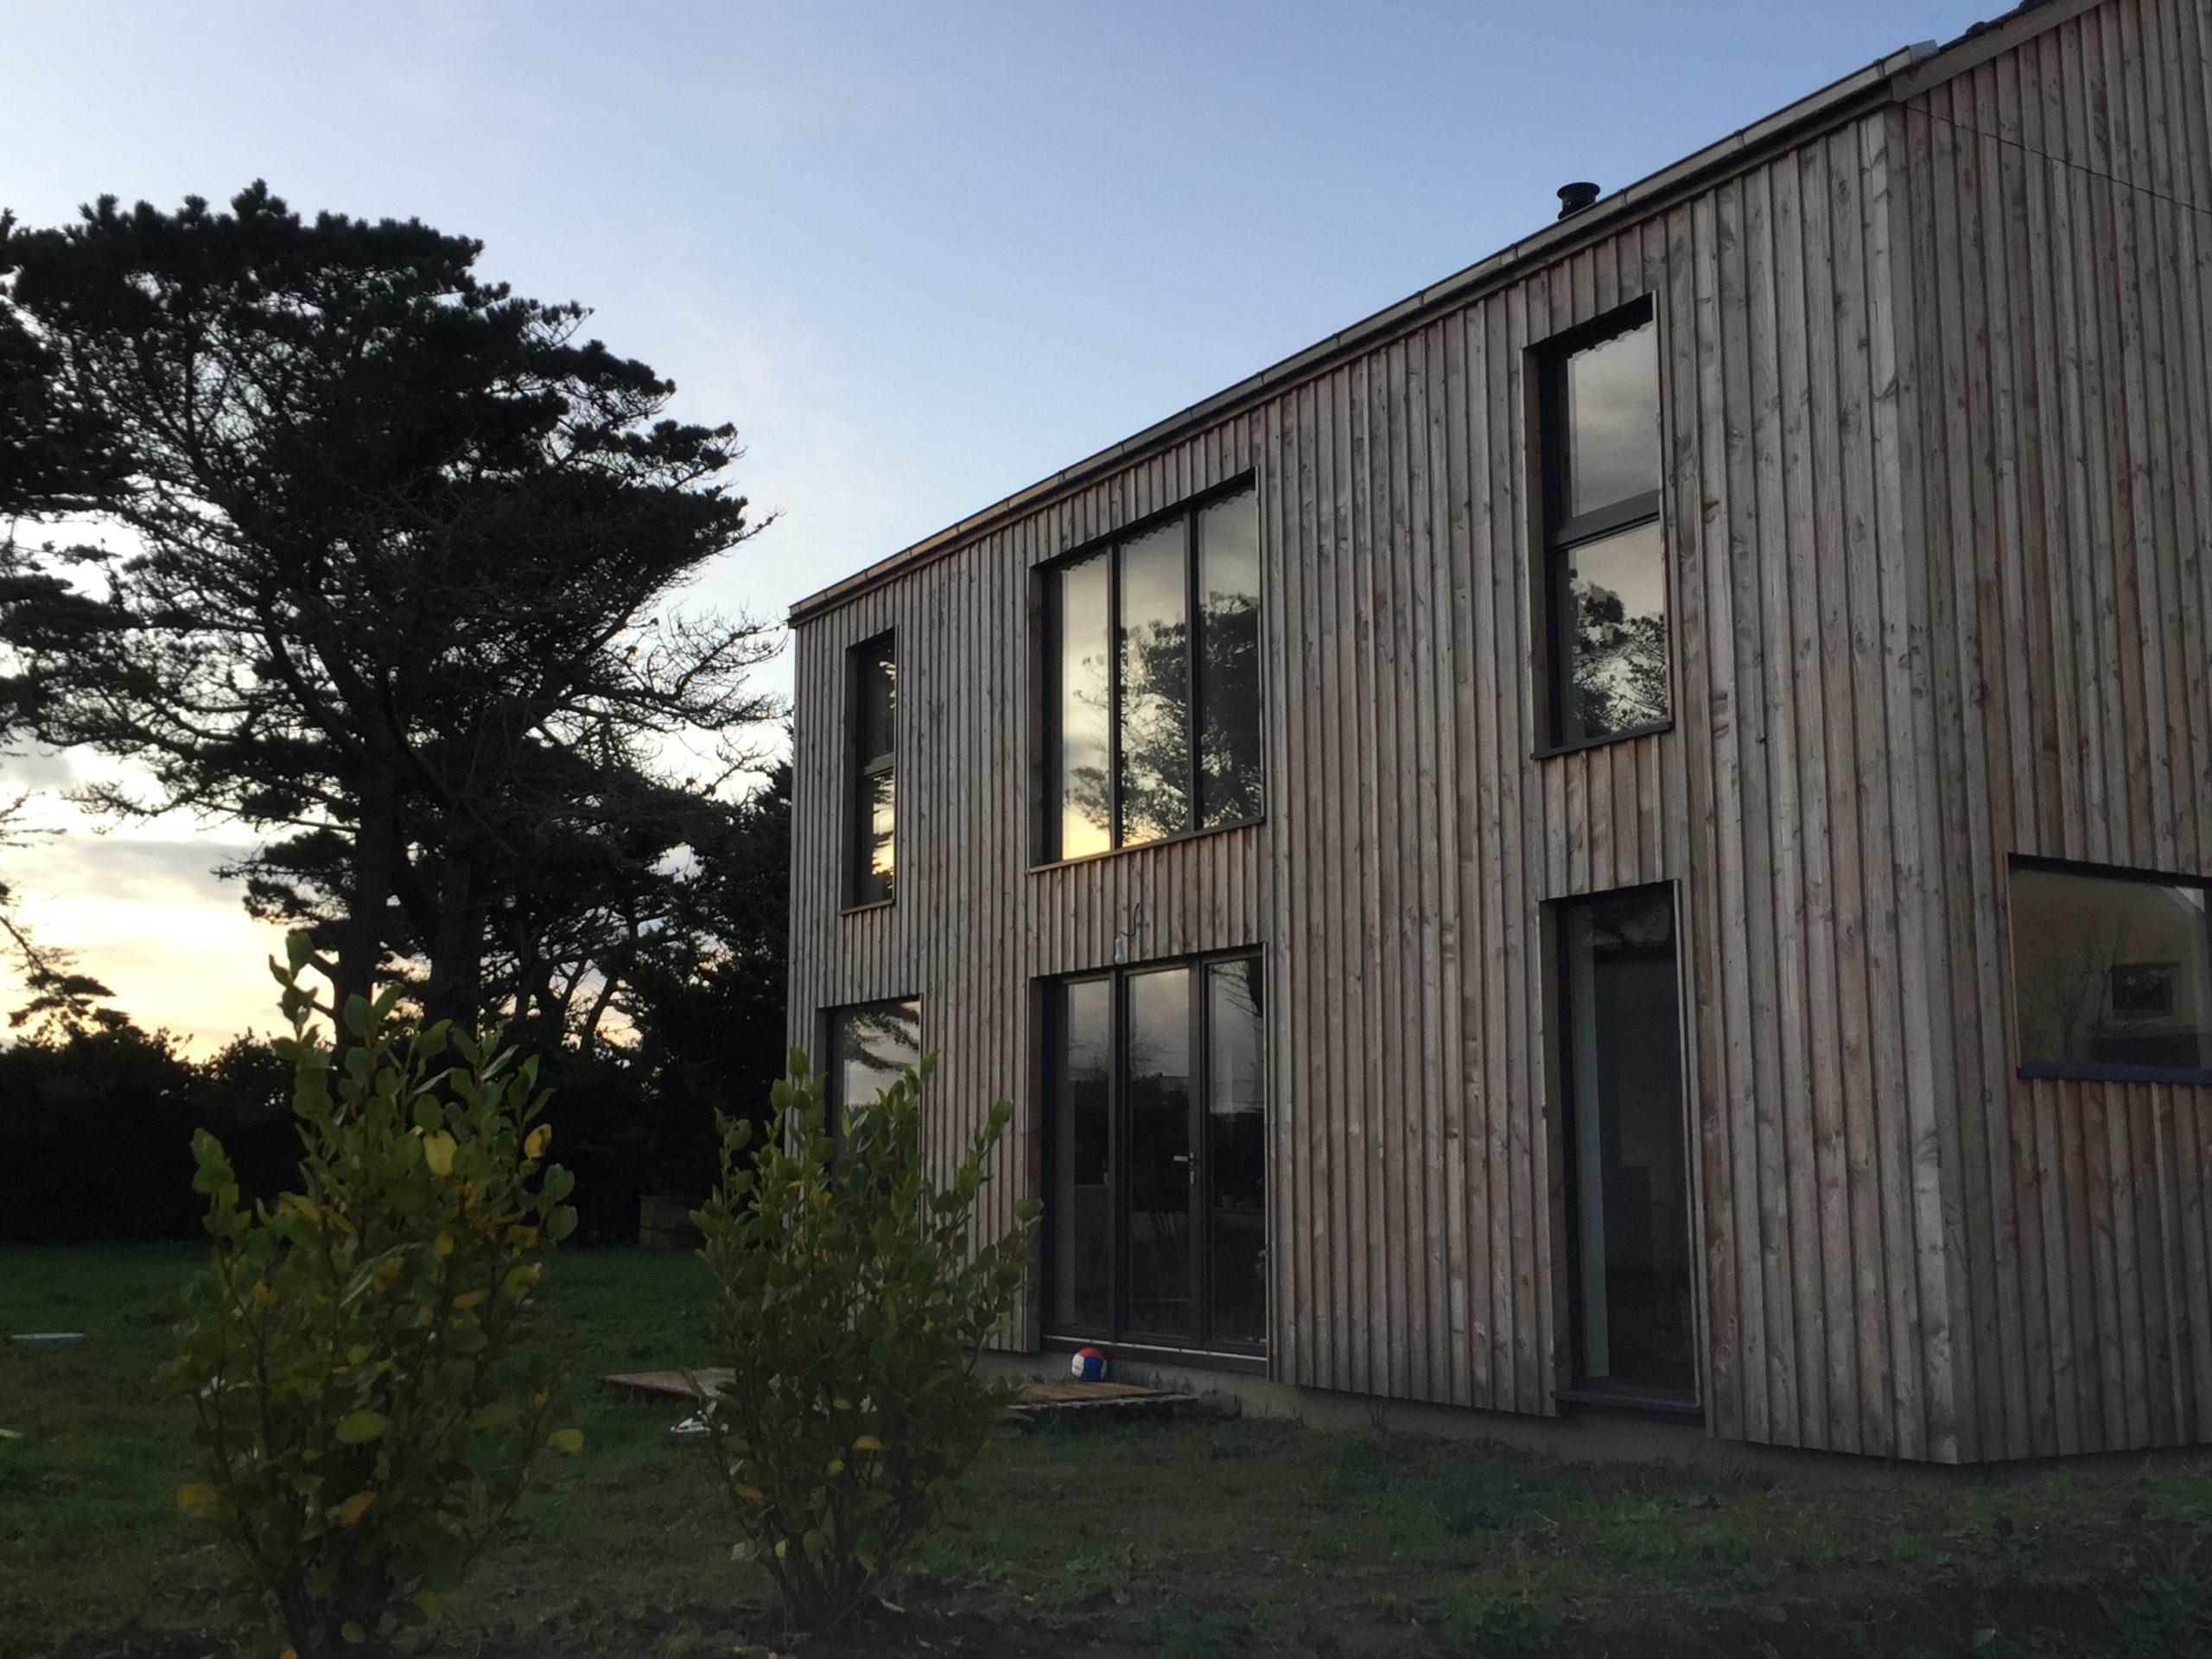 maison bois Portsall - L'acacia